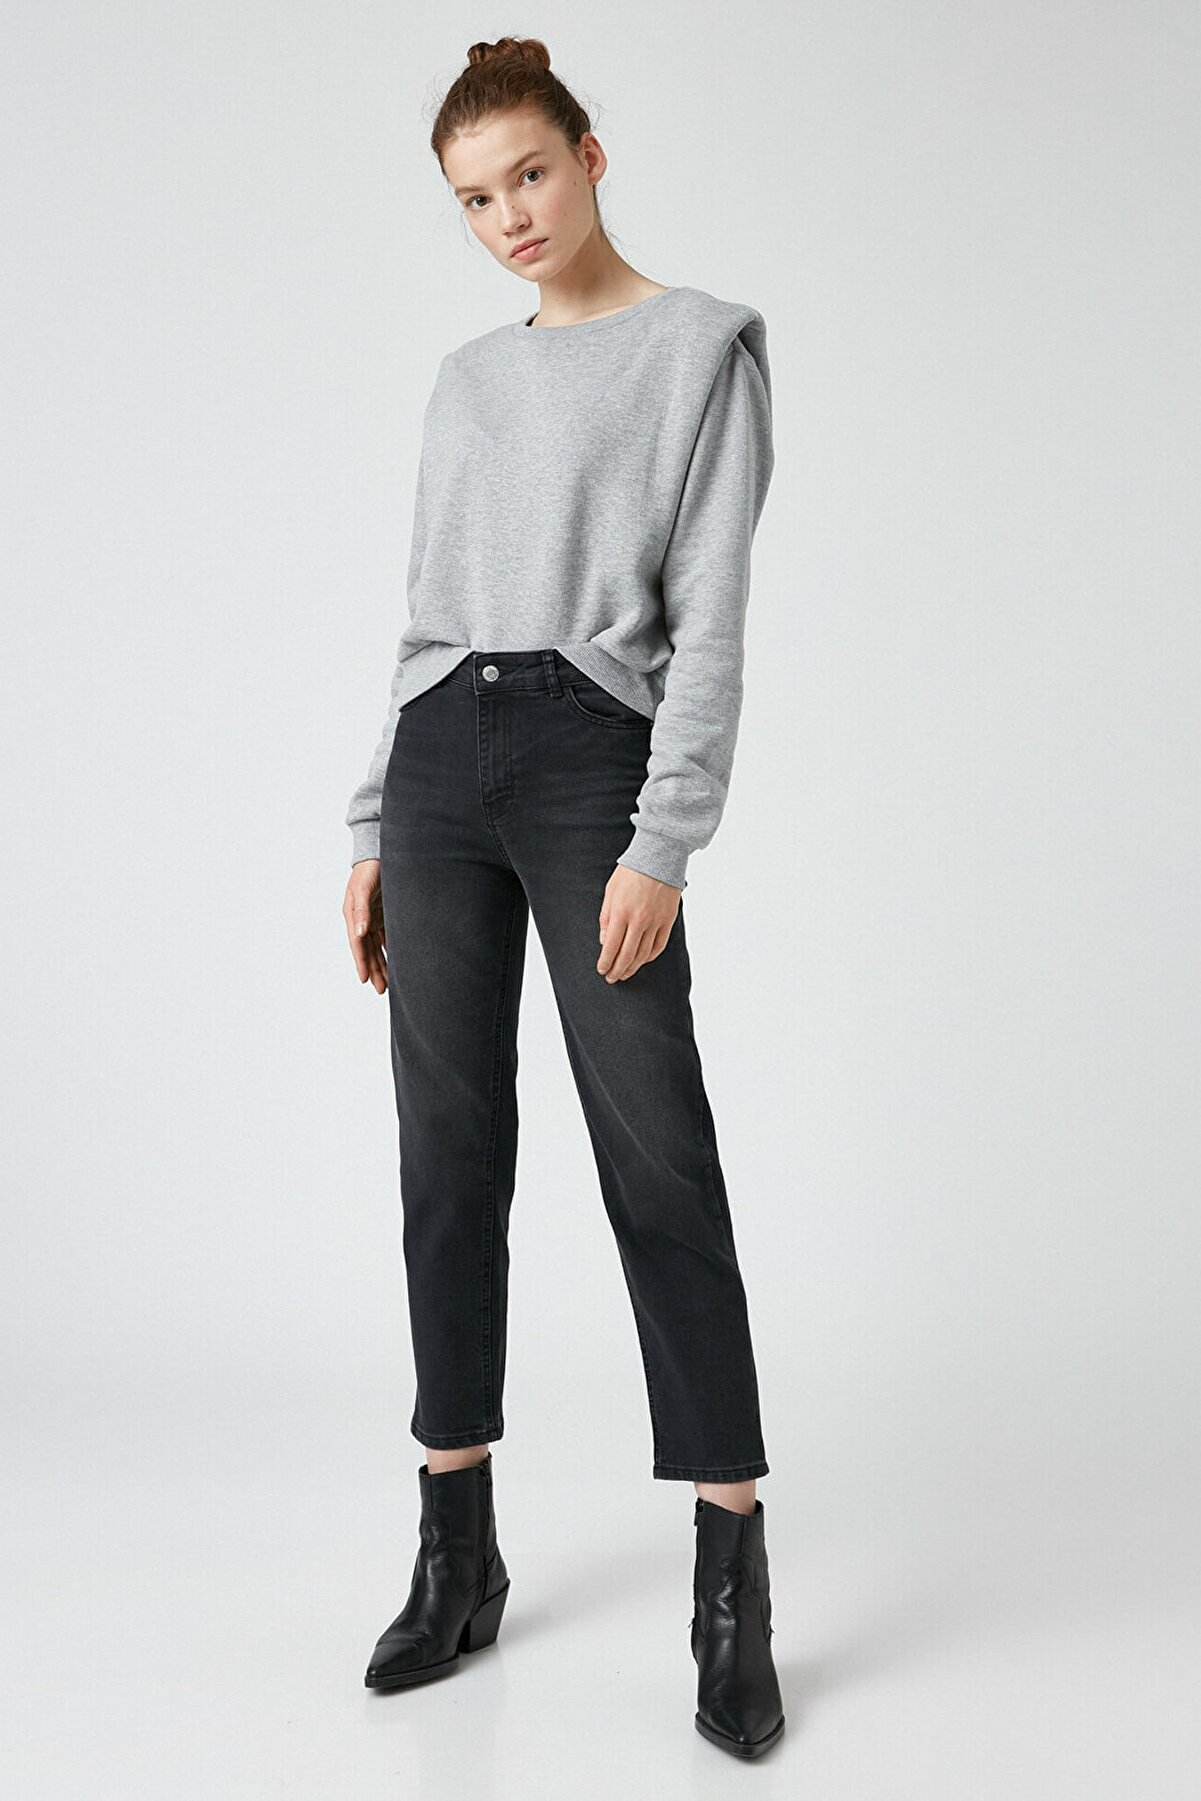 Koton Kadın Gri Jeans 1KAK47144MD